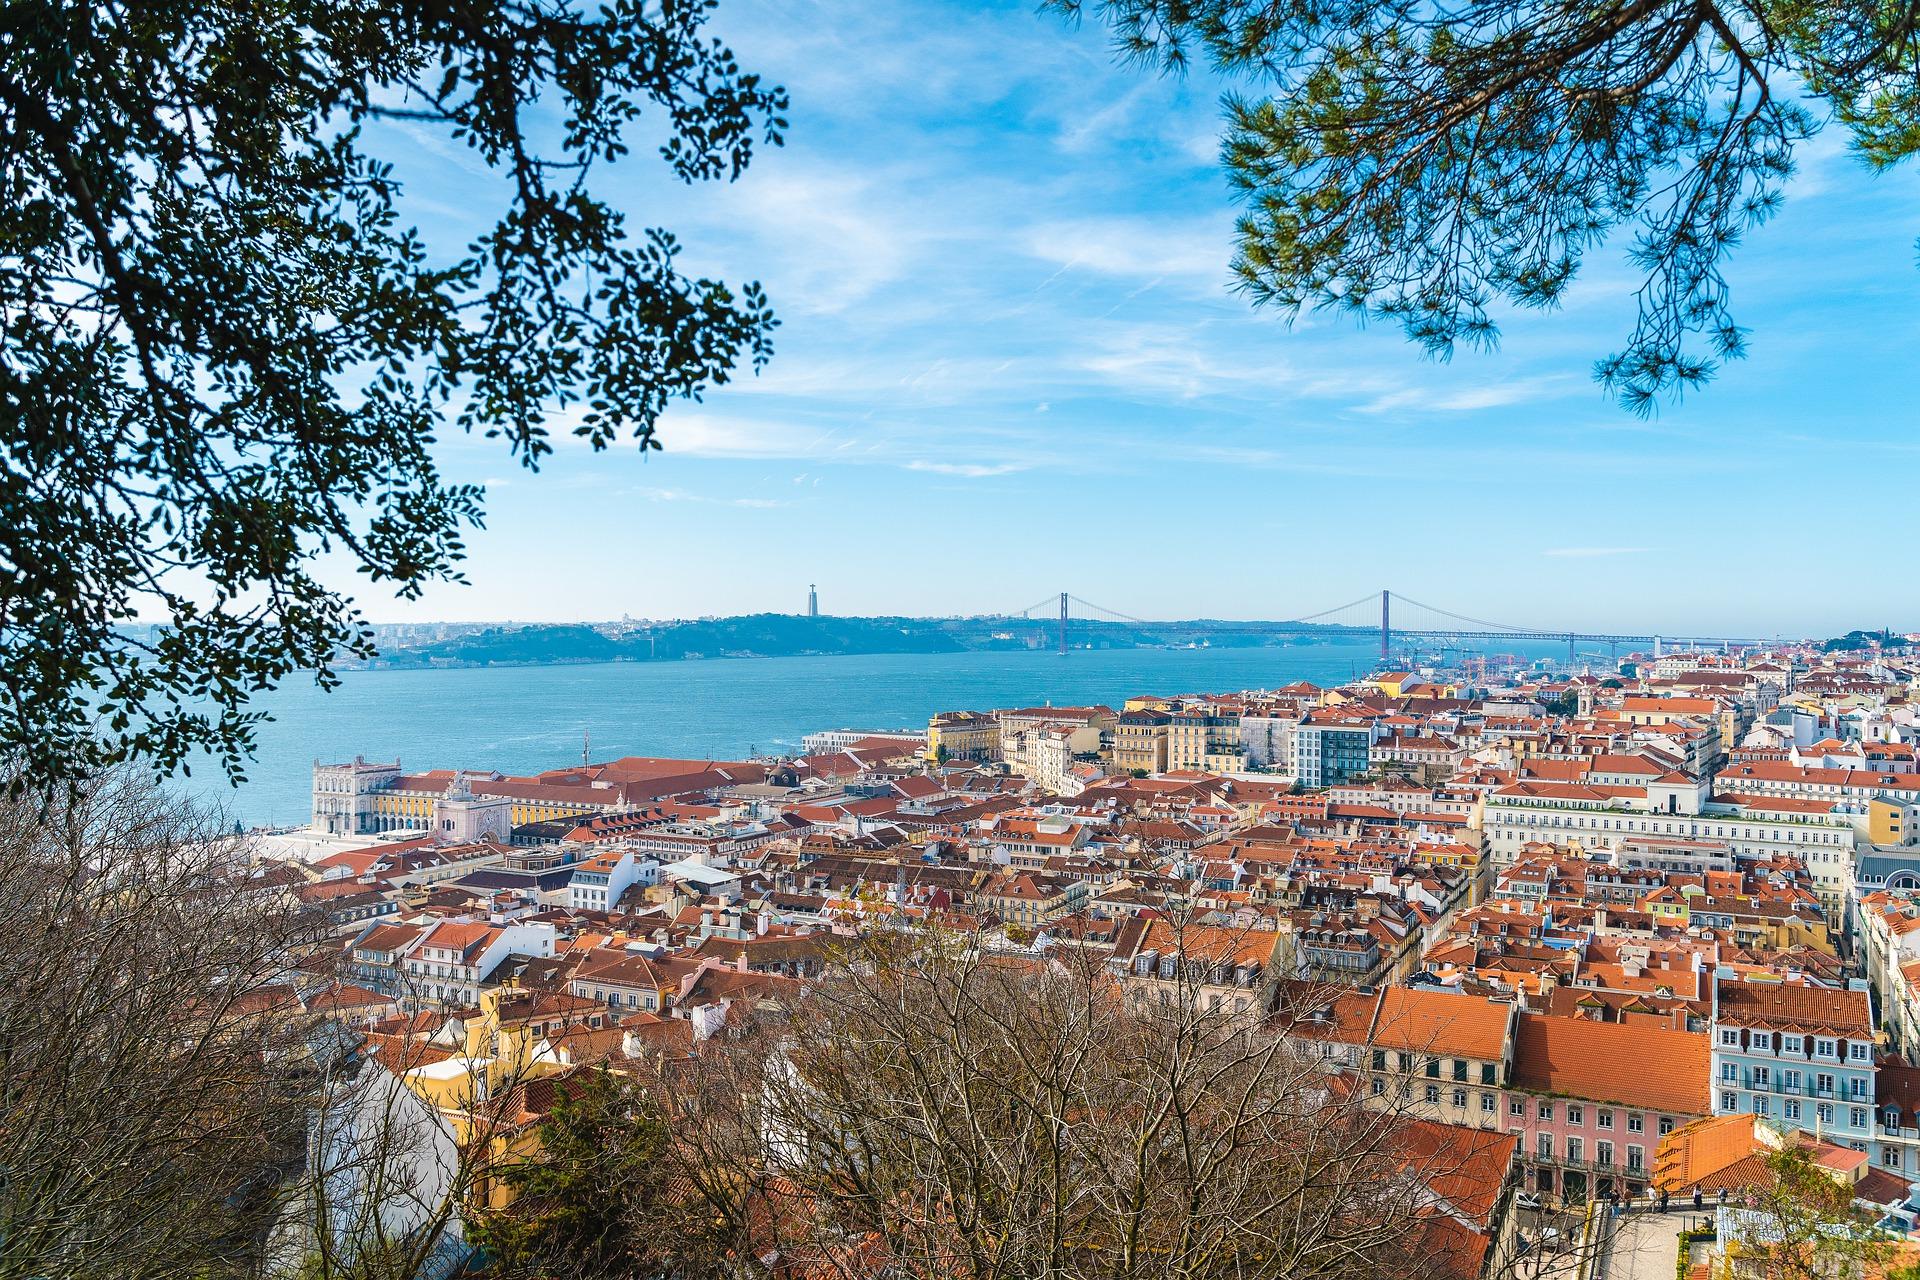 Arrendamento em Lisboa